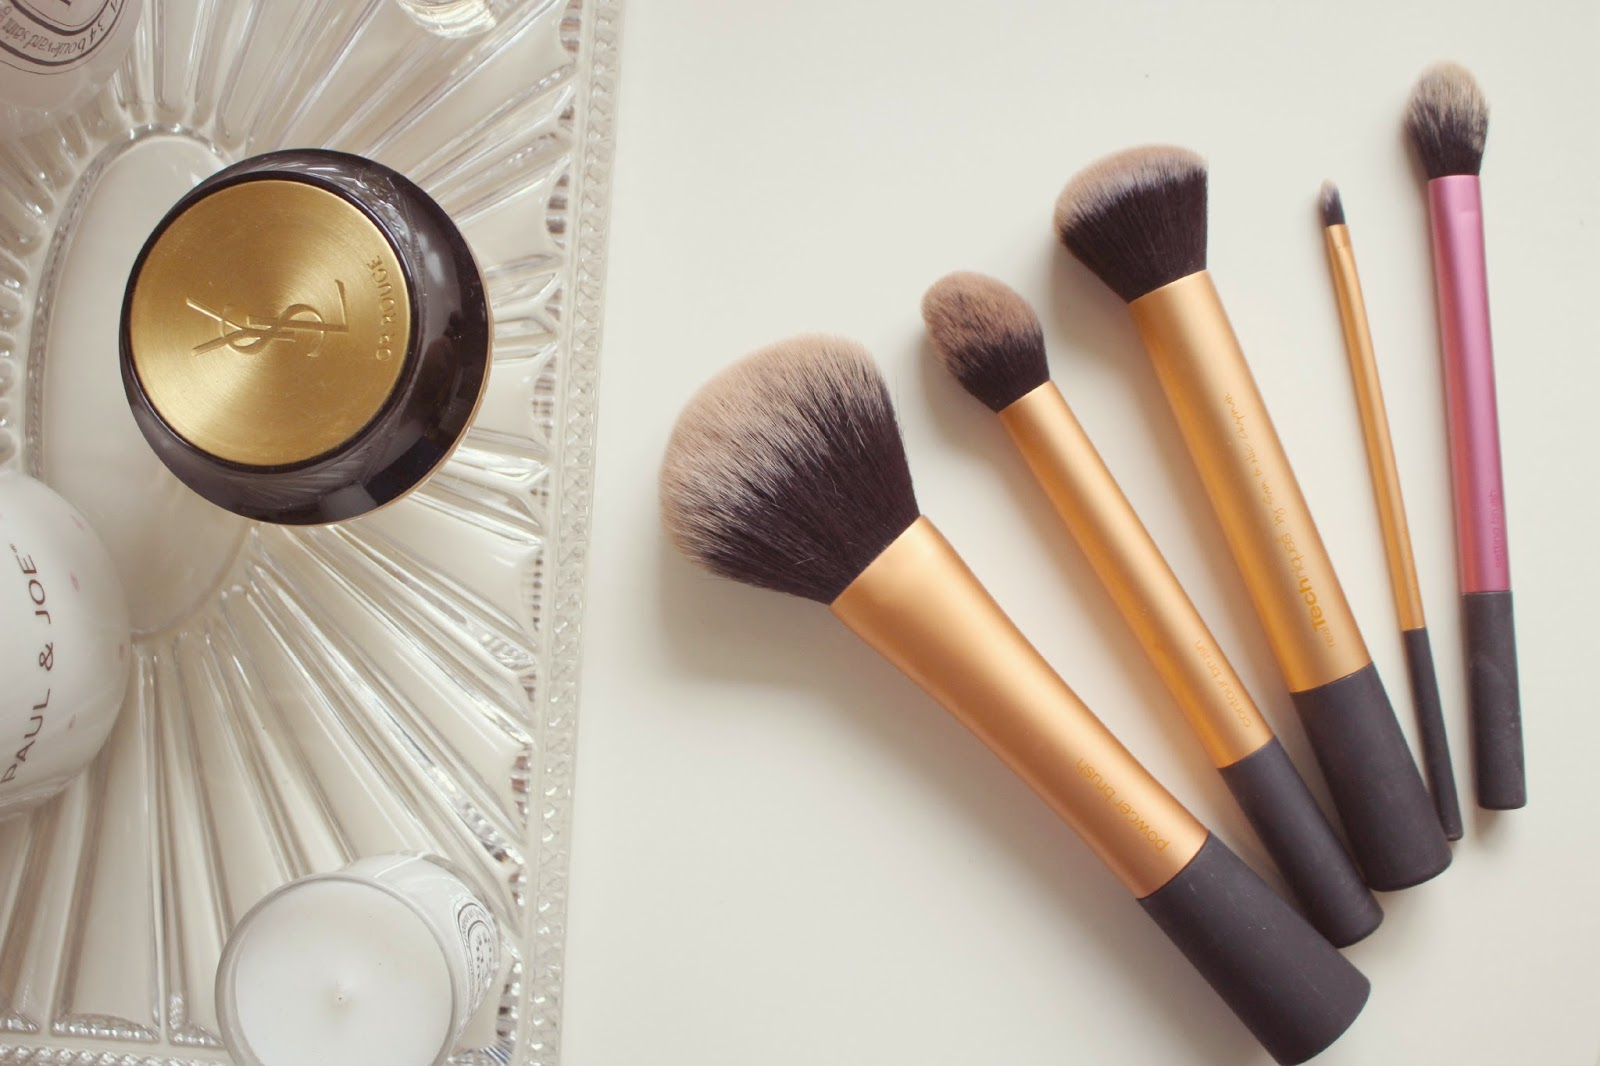 Tools Of The Trade | Makeup Brushes - Fashion Mumblr